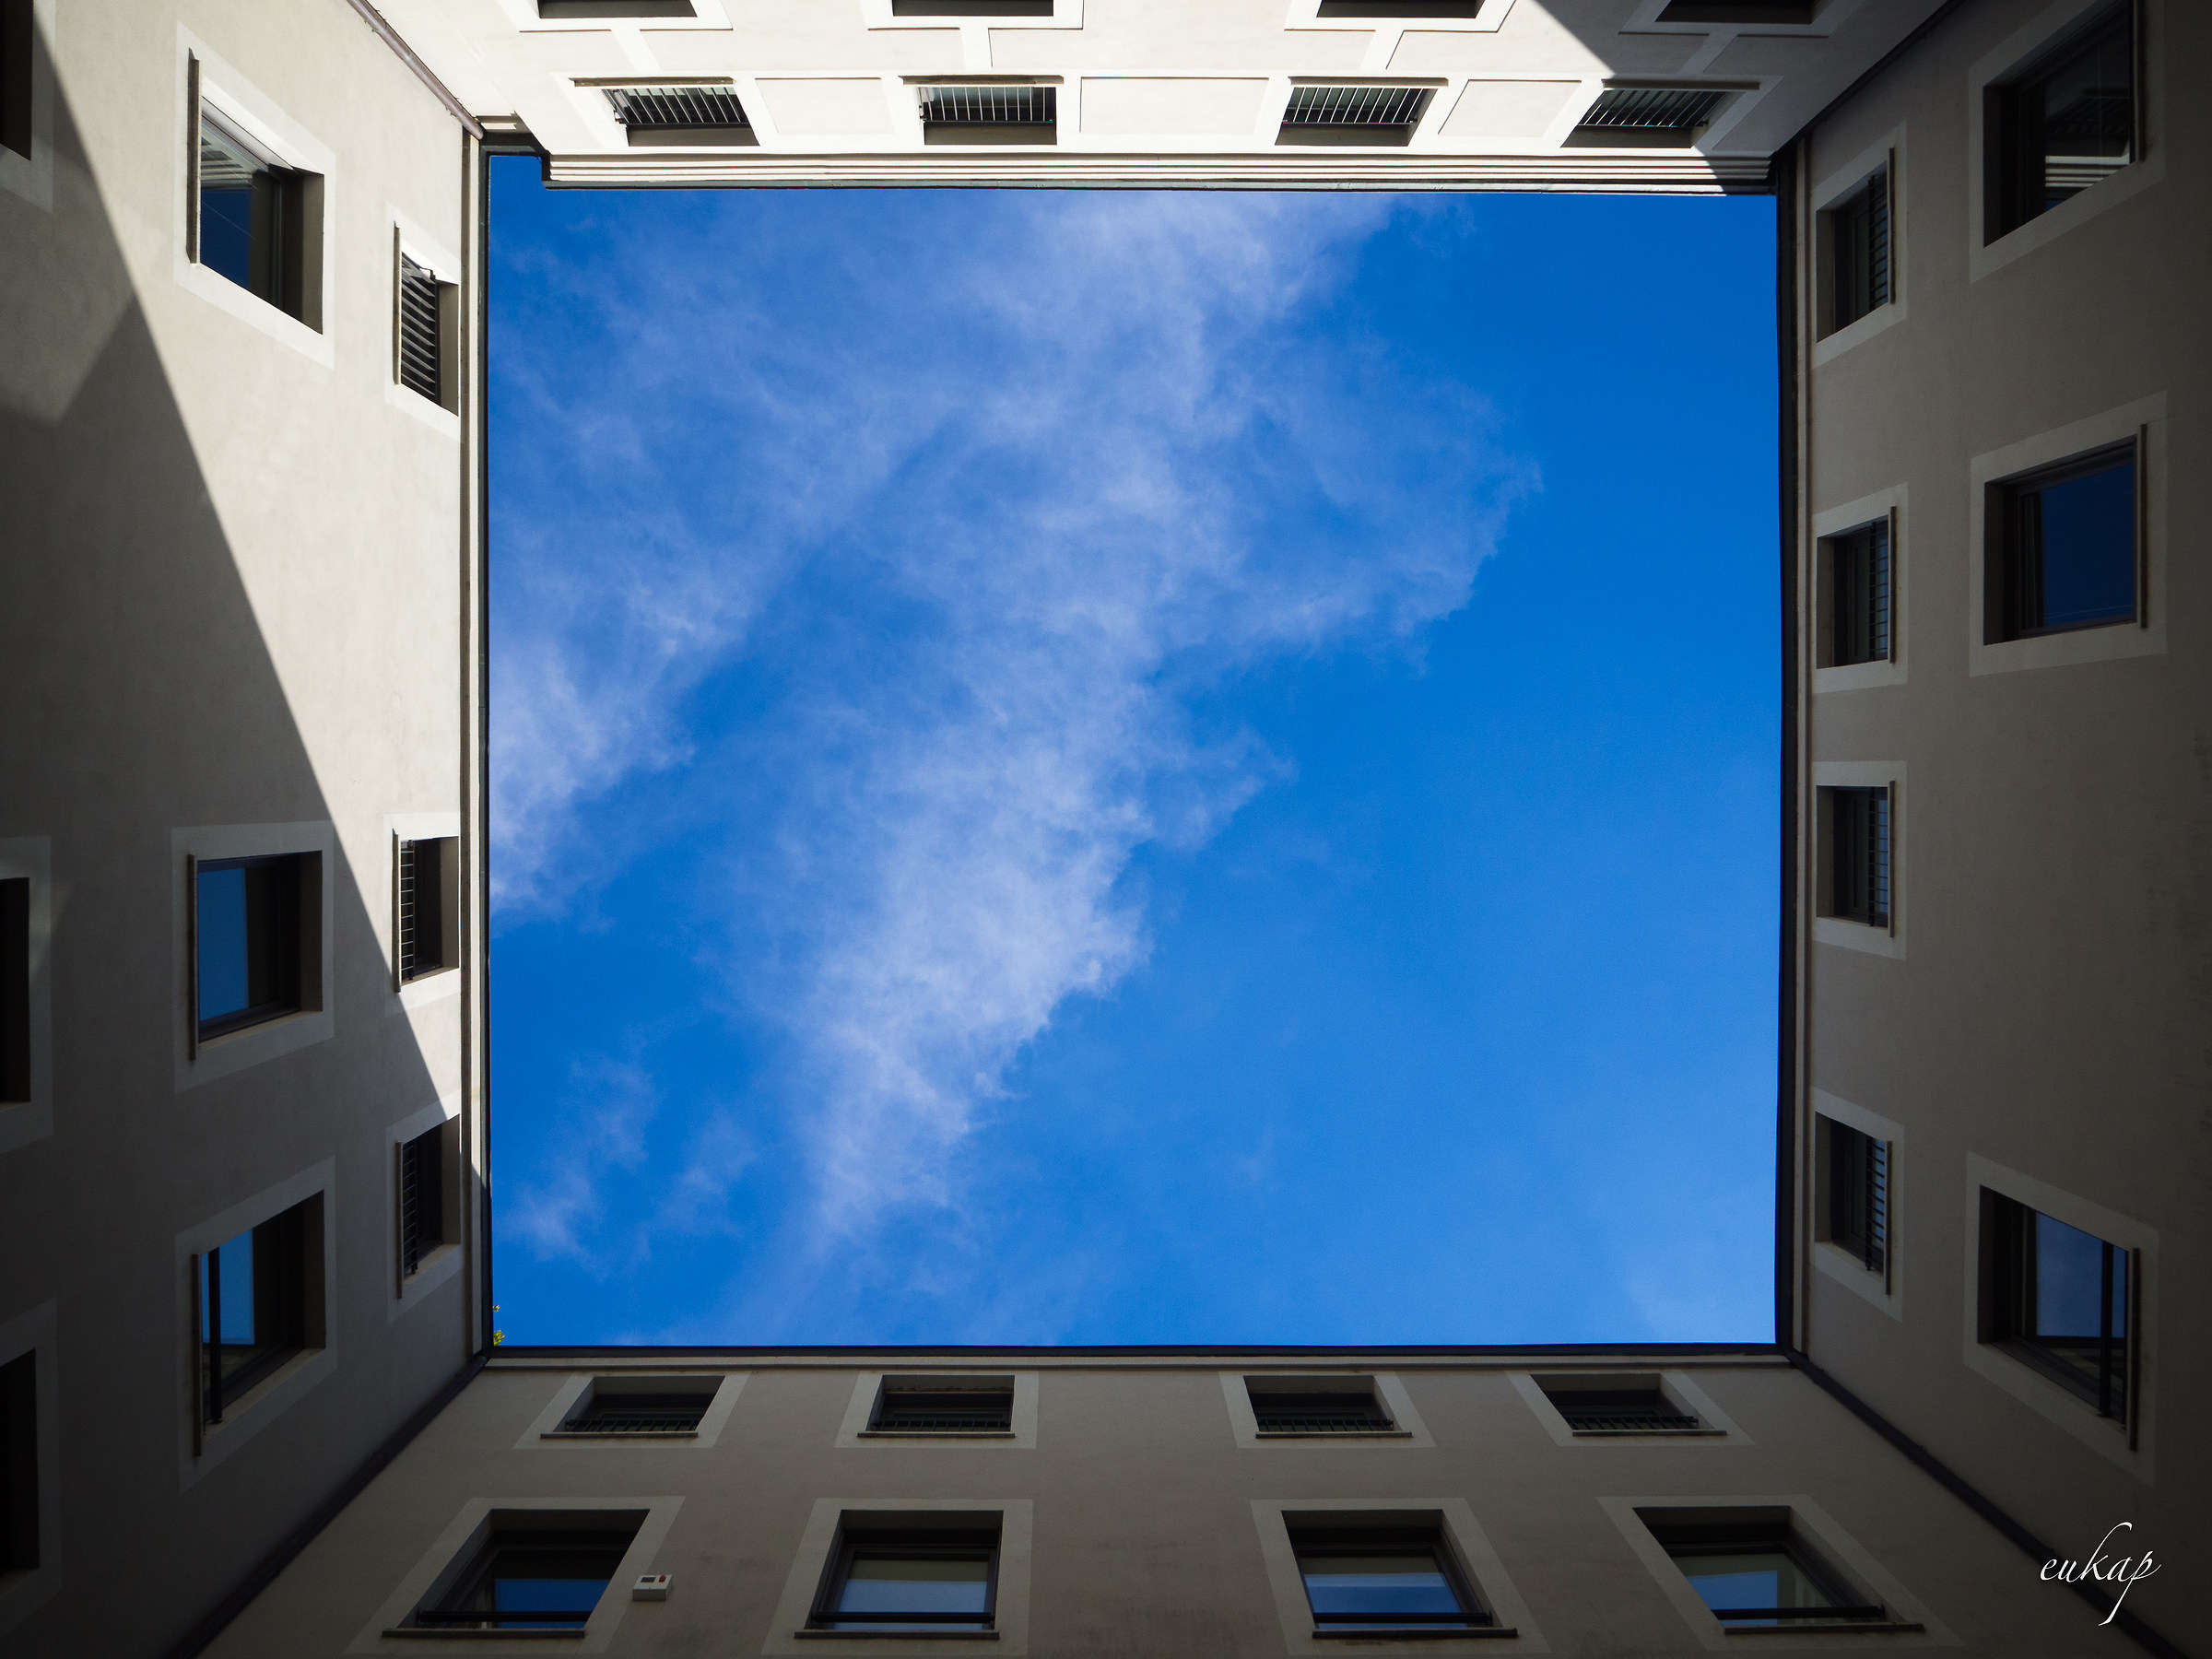 Una finestra sul cielo...